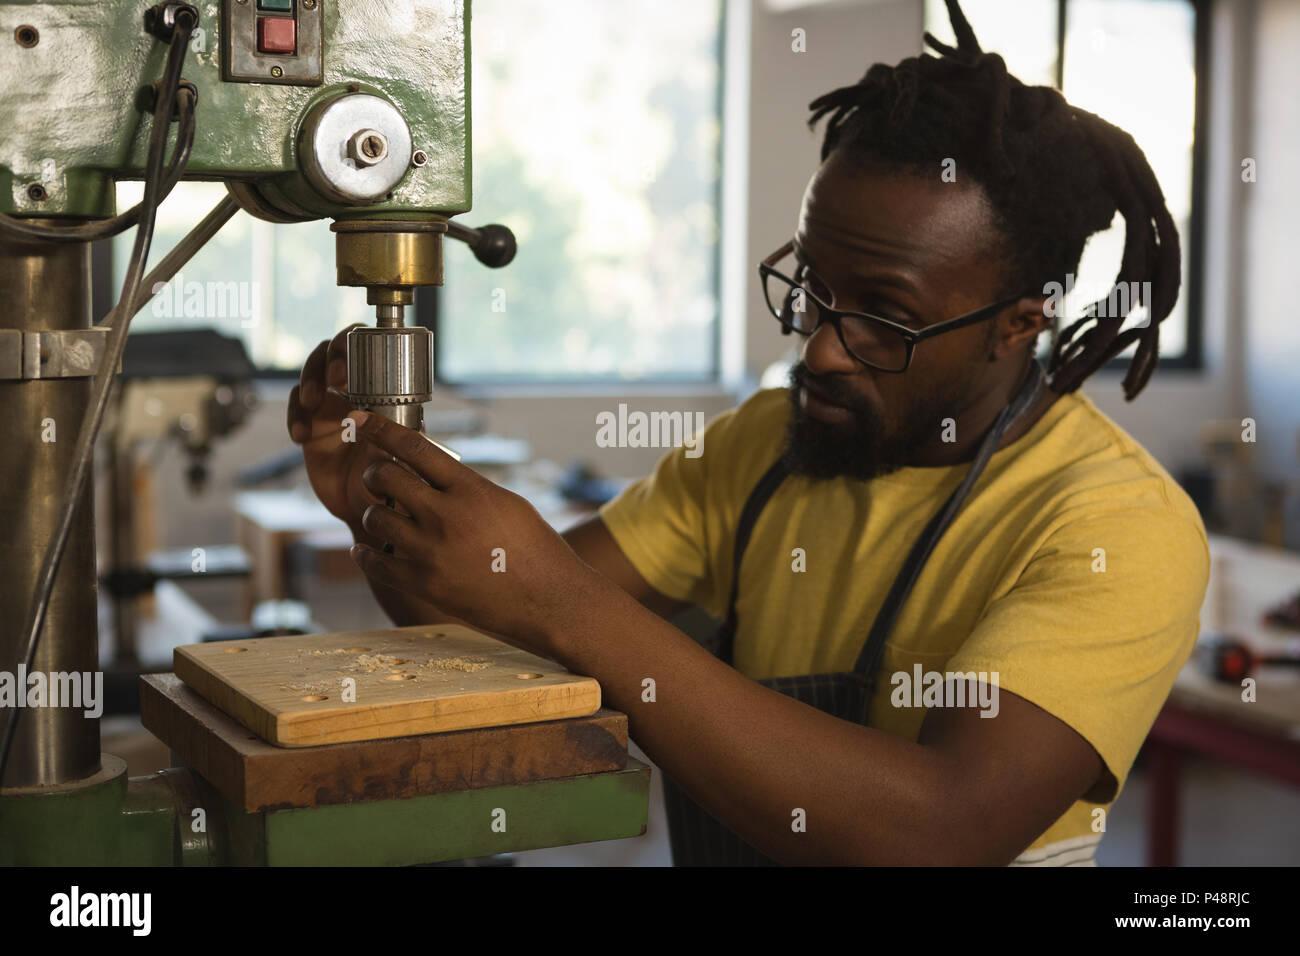 Carpenter adjusting drilling machine - Stock Image